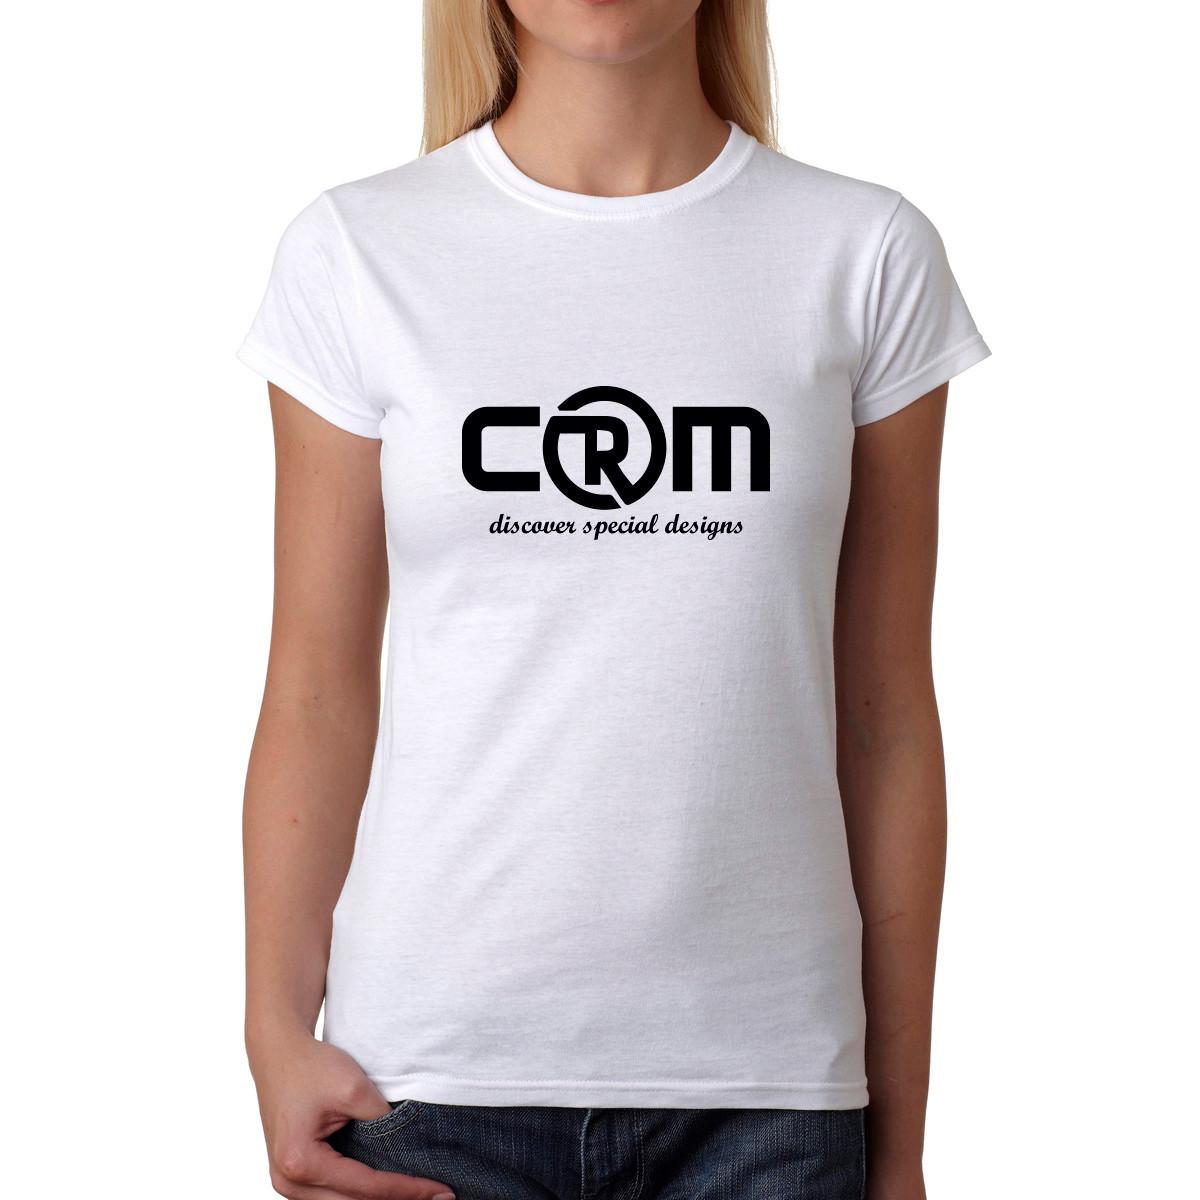 Gildan ® Softstyle ® Ladies' T-Shirt